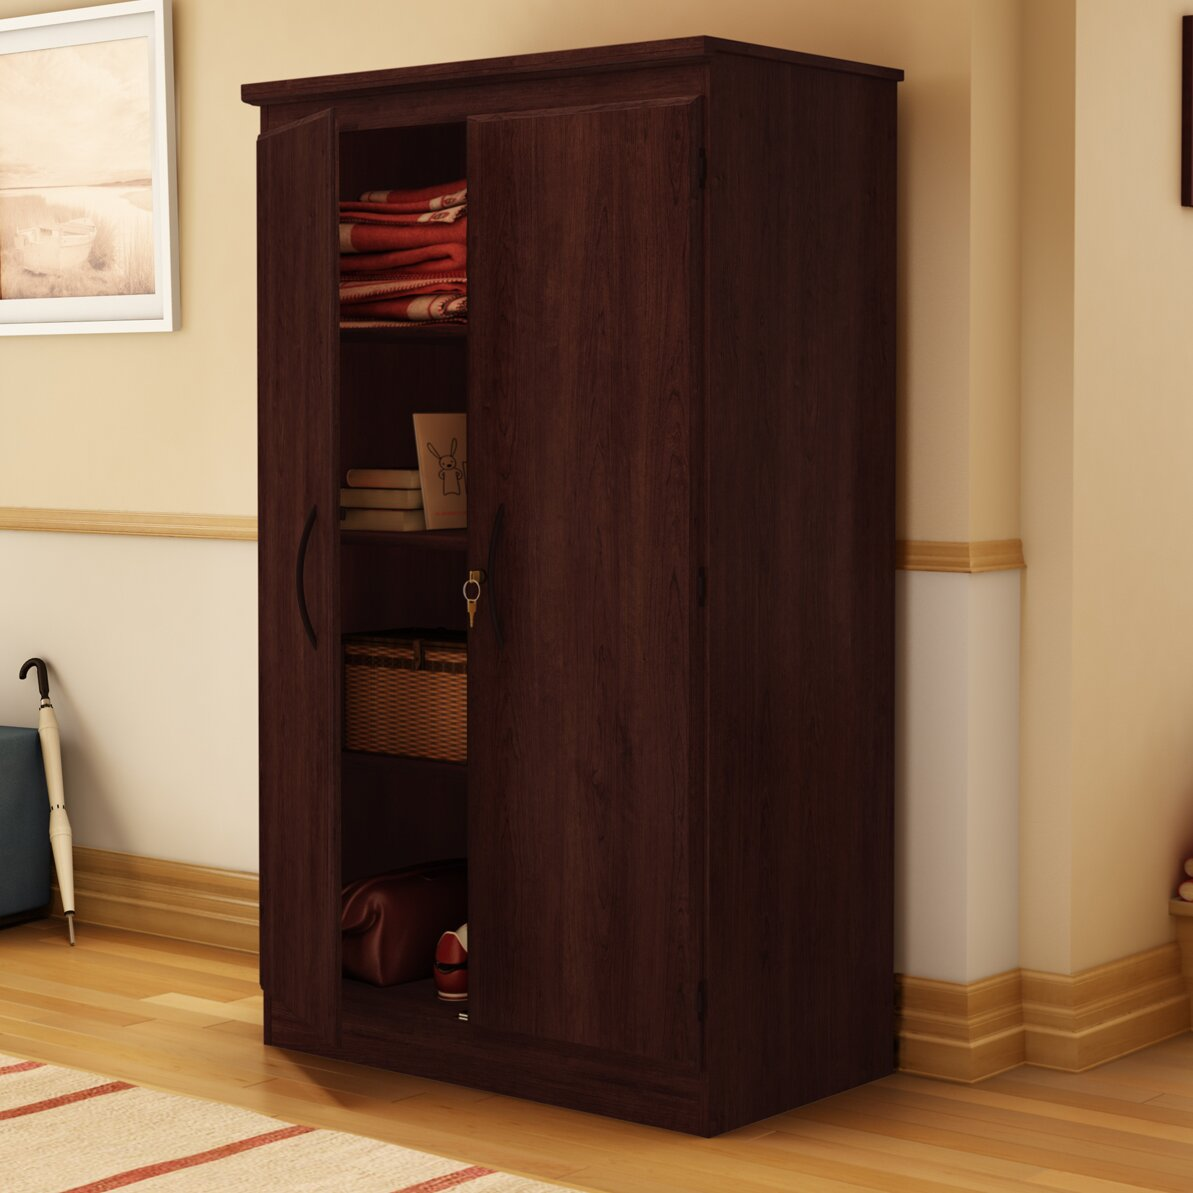 Corner Wall Cabinet Organizer Office Storage Cabinets Youll Love Wayfair